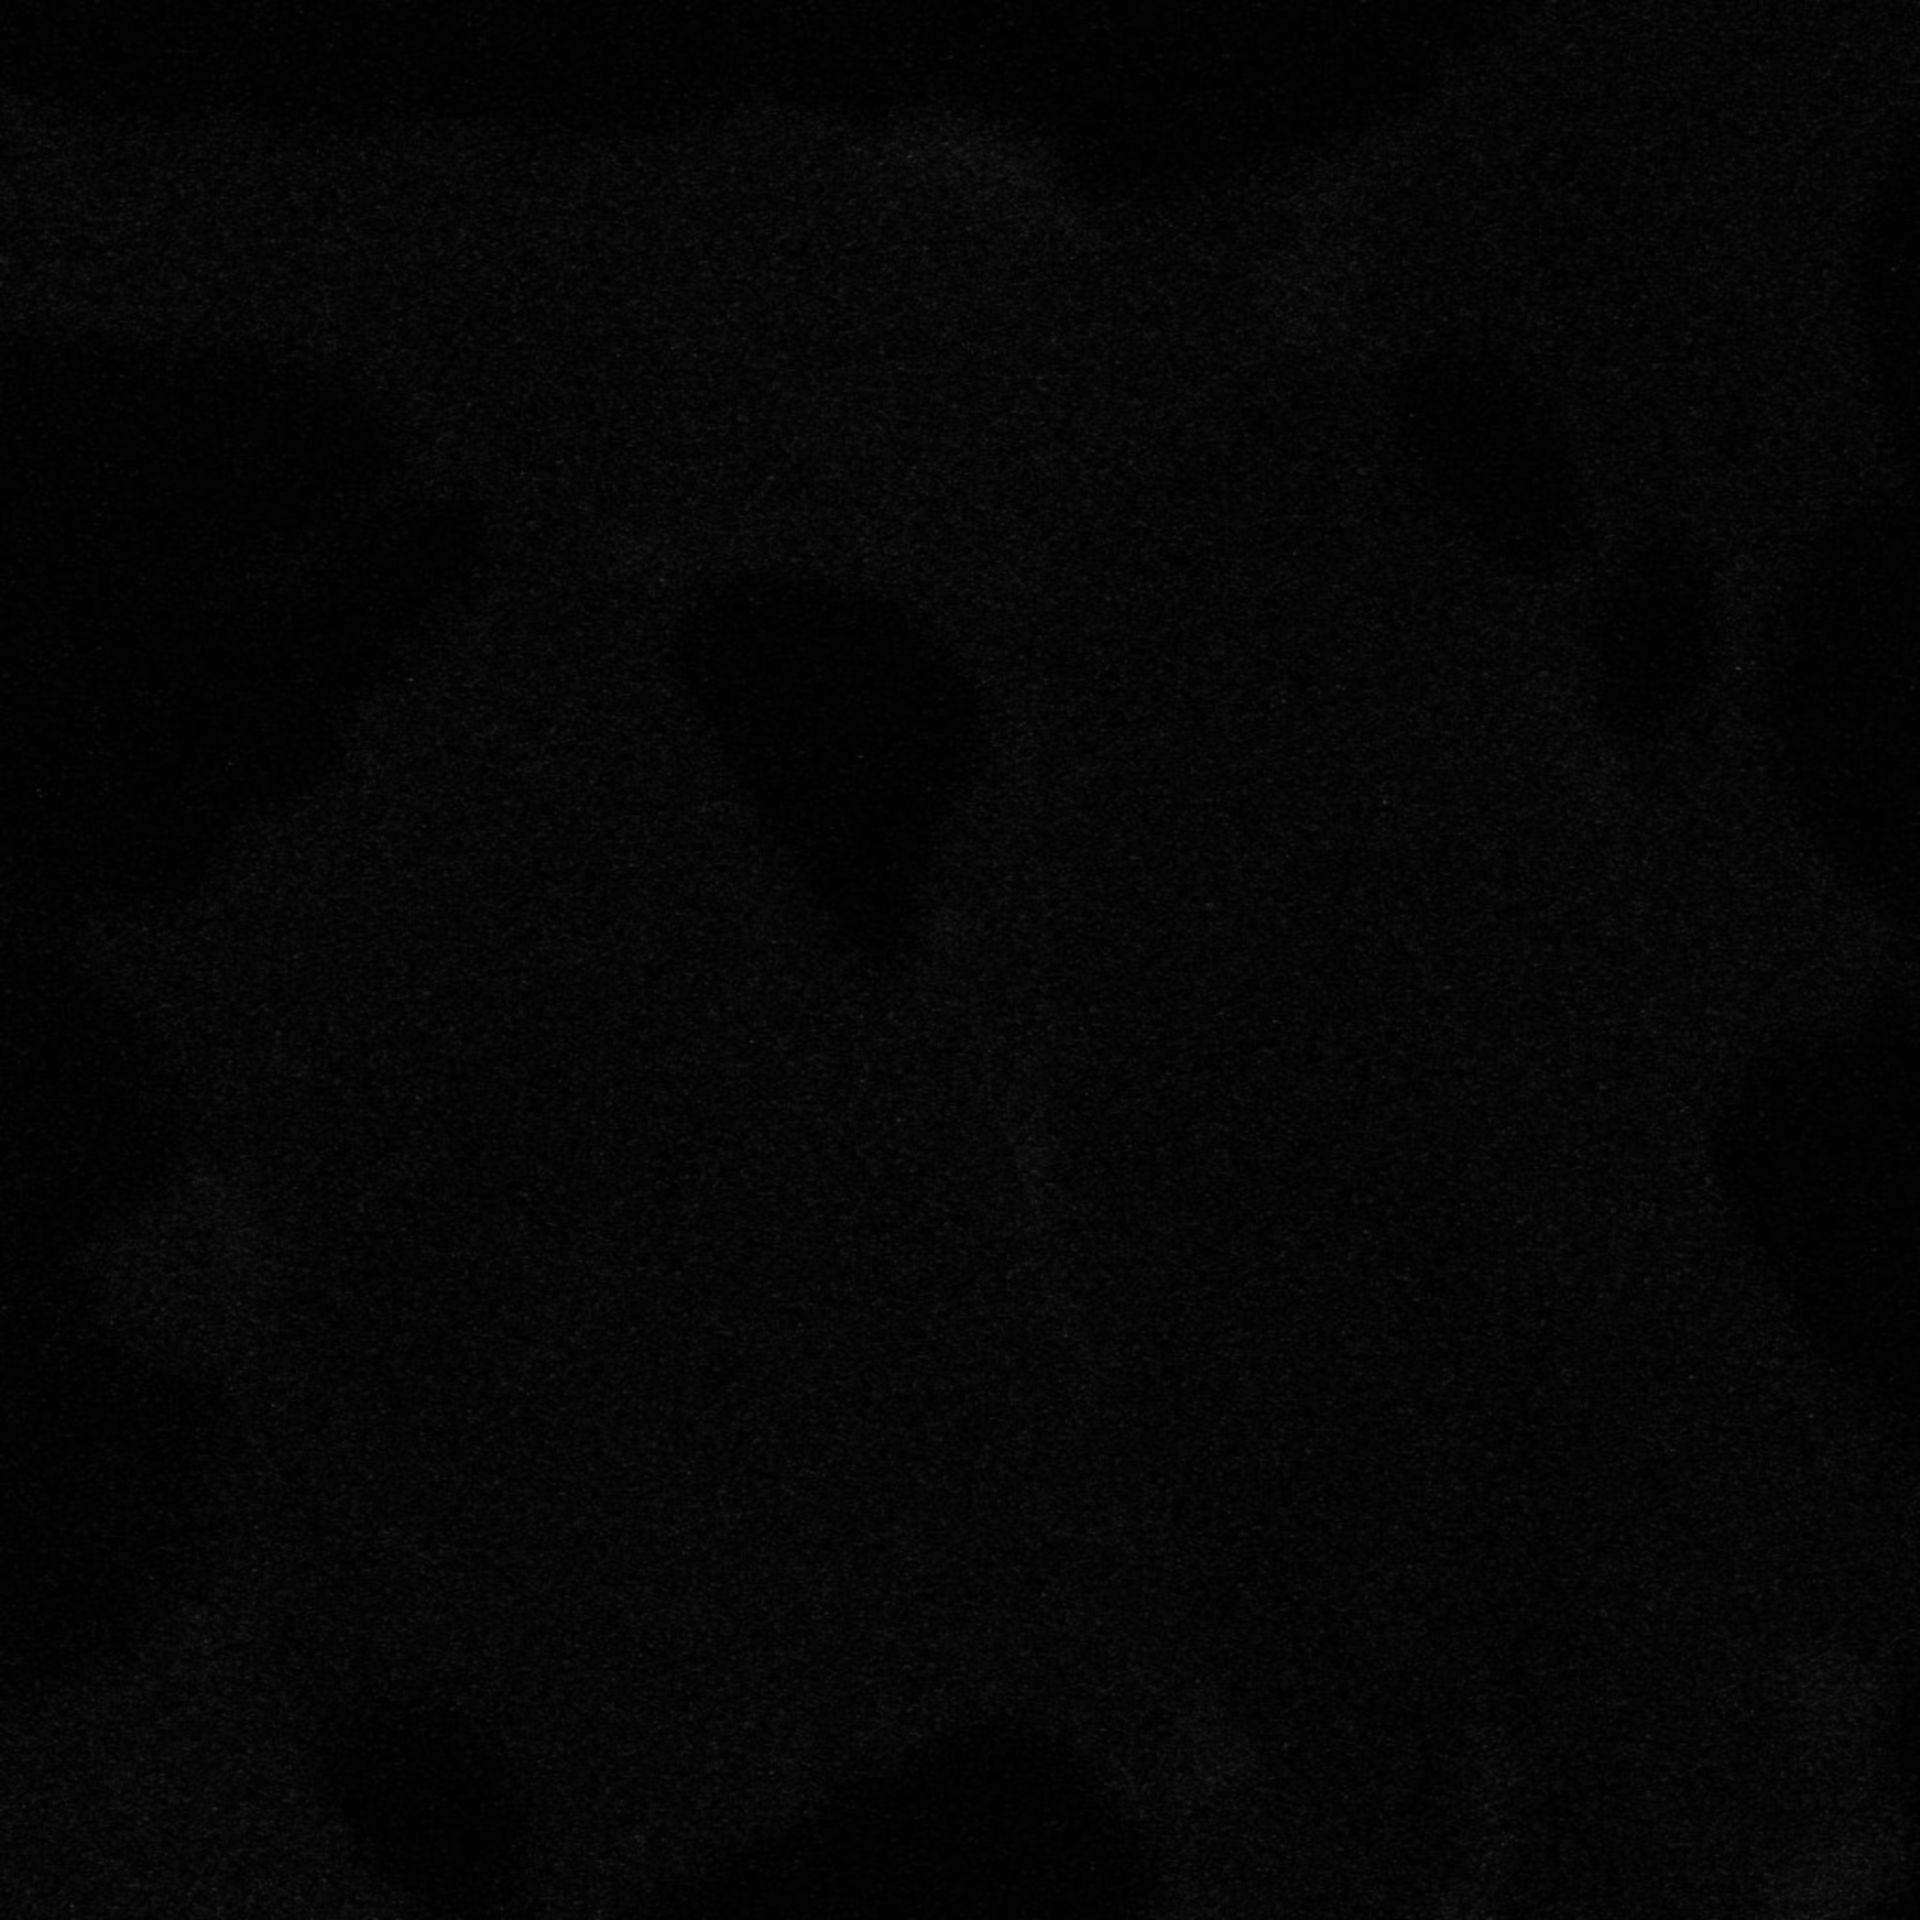 Chlorocebus sabaeus (membrana plasmatica) - CIL:725